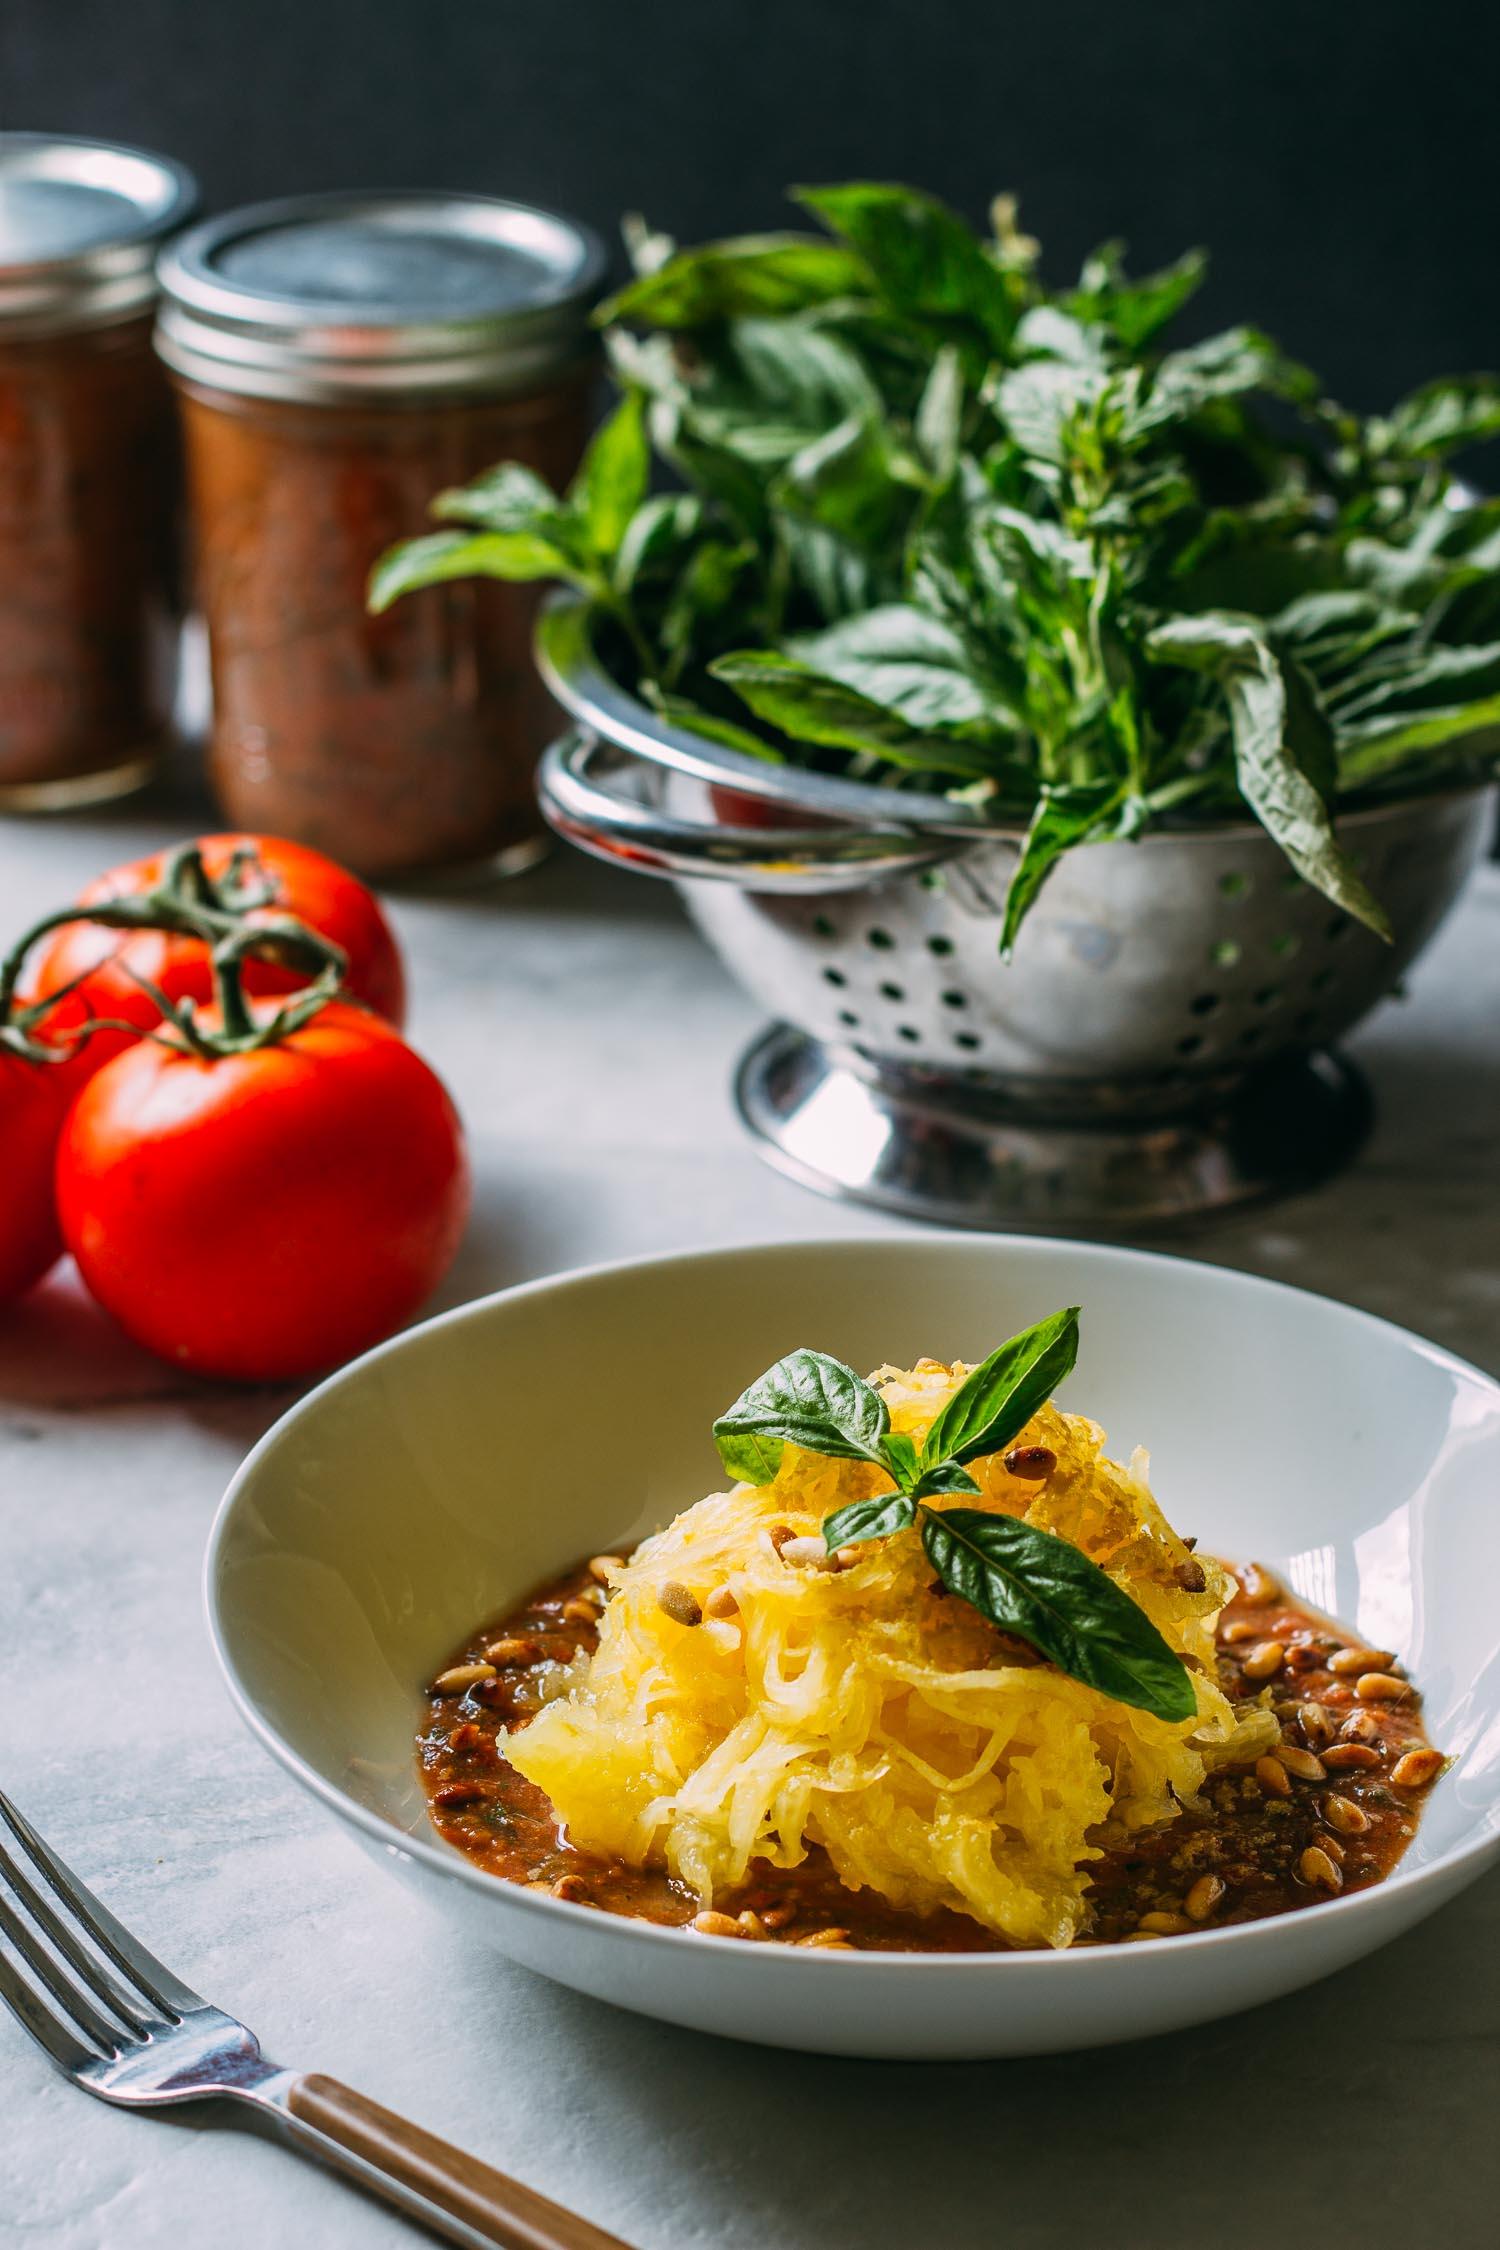 5-Minute Tomato Basil Pesto Sauce #sun-dried #tomato #tomatoes #basil #pesto #garlic #sauce #pasta #no-cook #blender #oregano #herbs #vegan #plant-based #simple #recipe #wfpb #recipes #wfpbno #gluten-free #Italian #5-minutes #healthy #fit